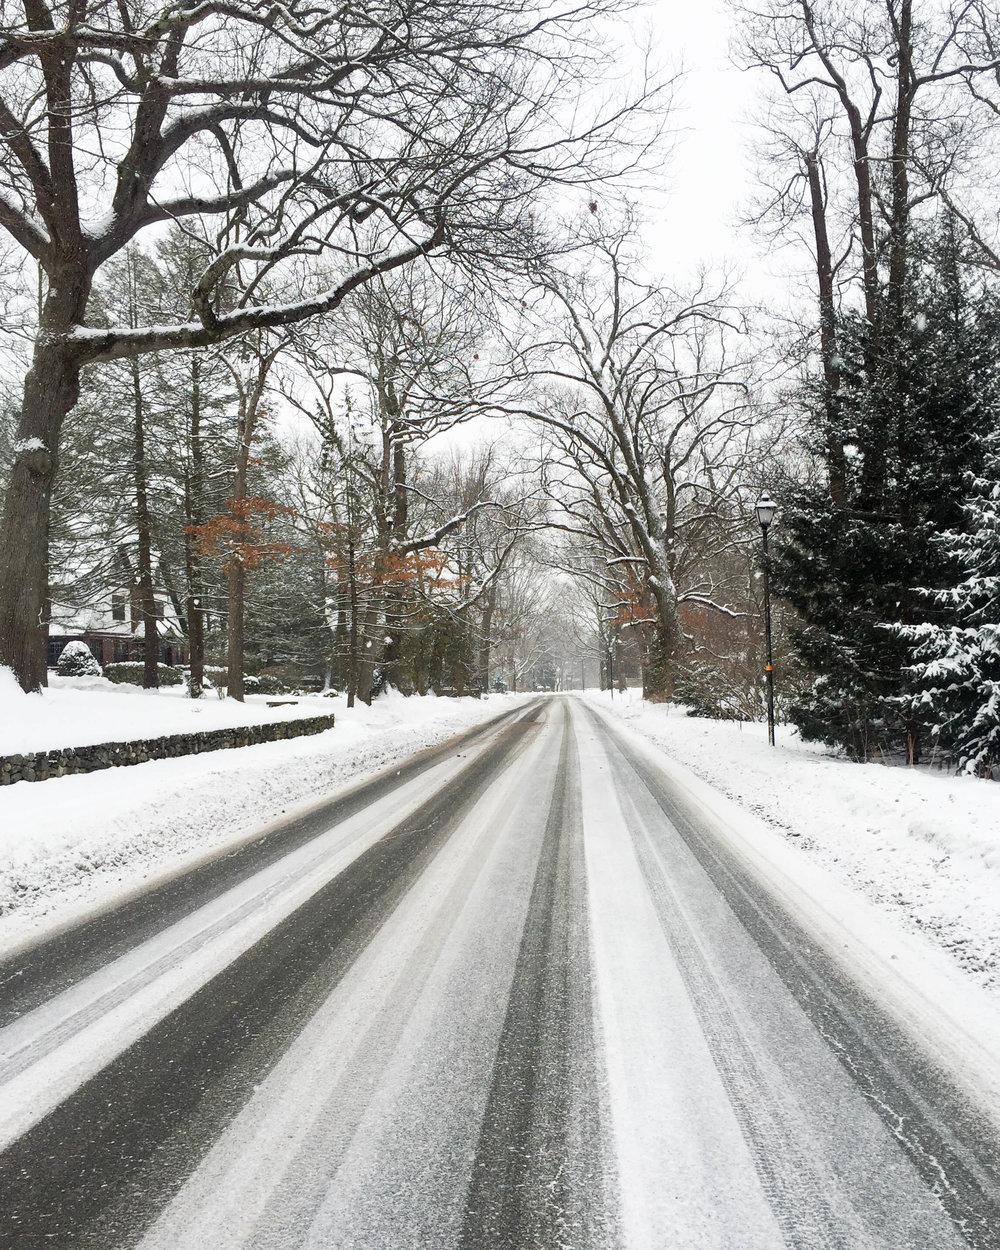 Yesterday's winter wonderland in Boston